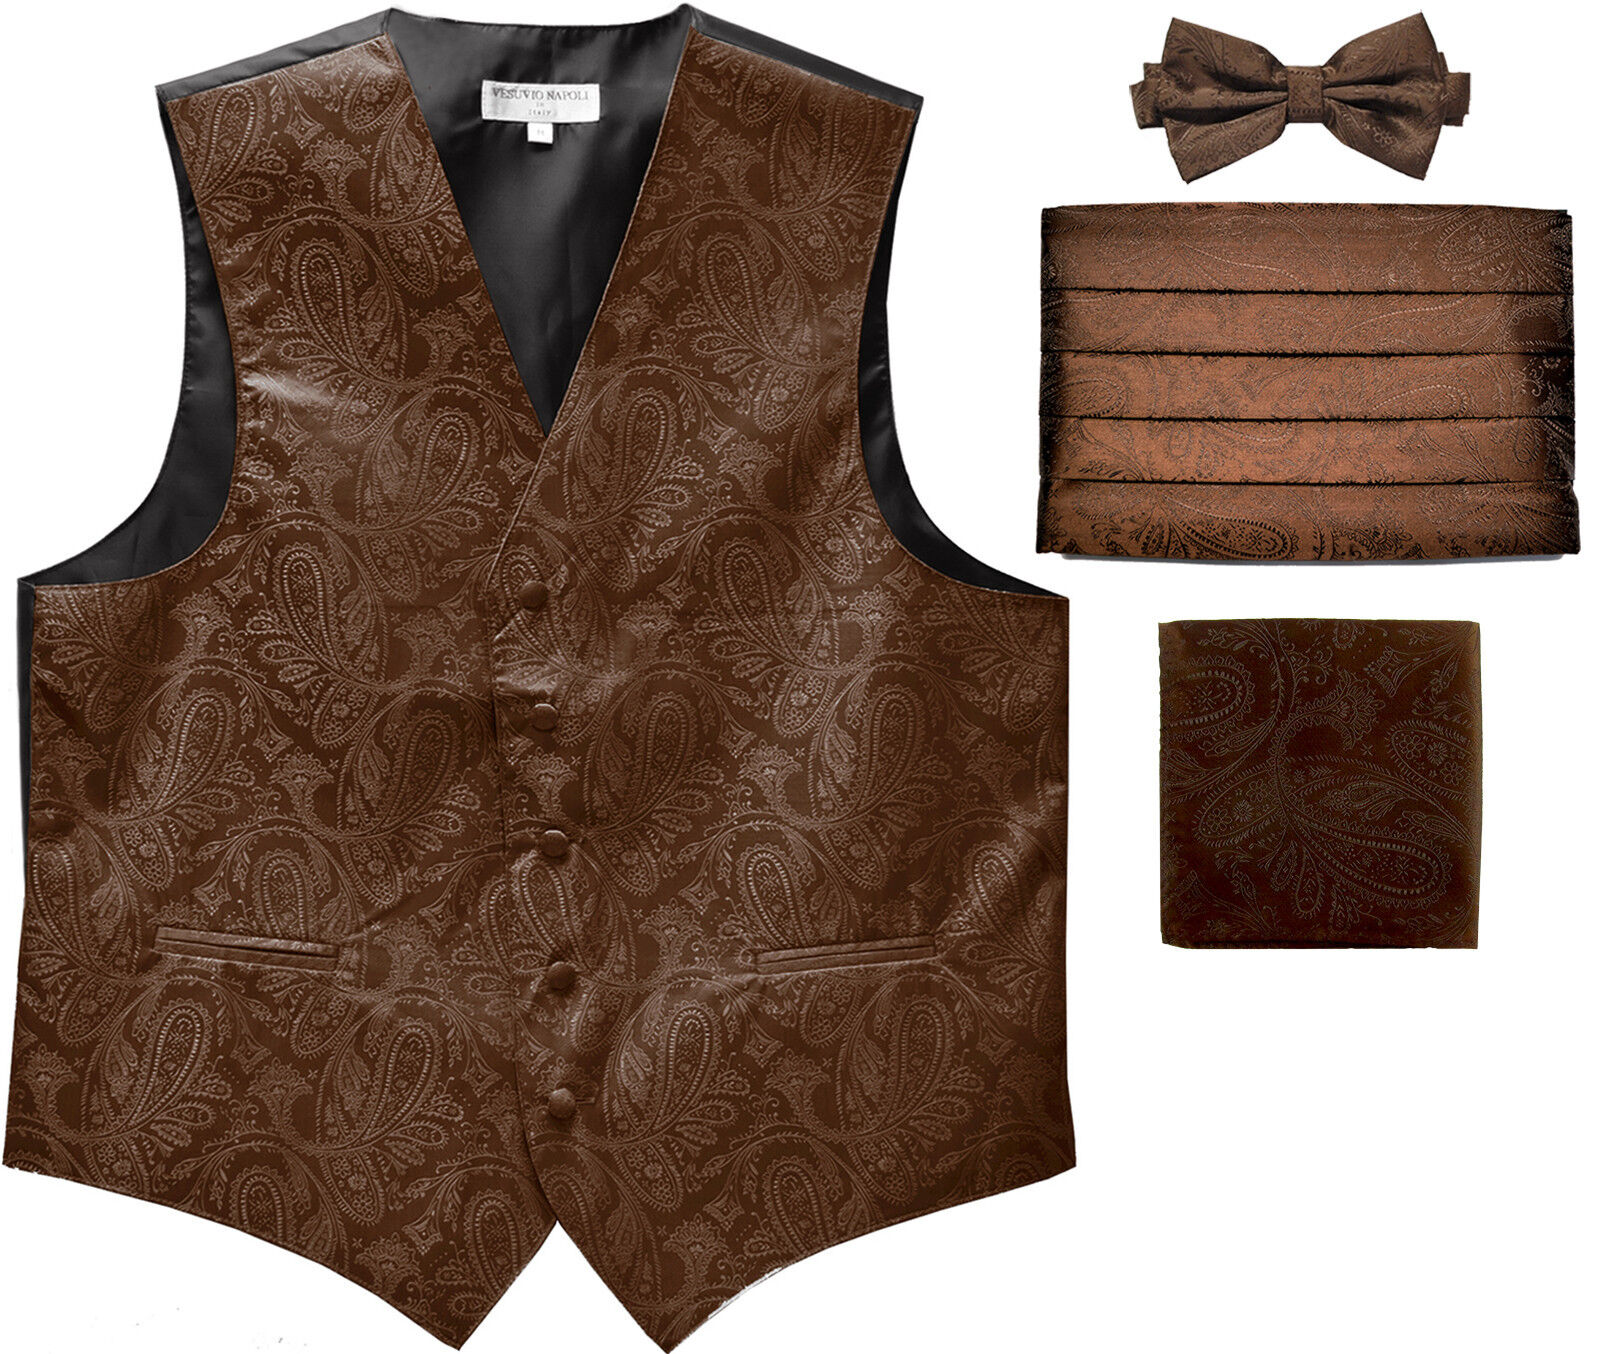 New Men's Paisley Tuxedo Vest Waistcoat & Cummerbund & Bow tie & Hankie Brown